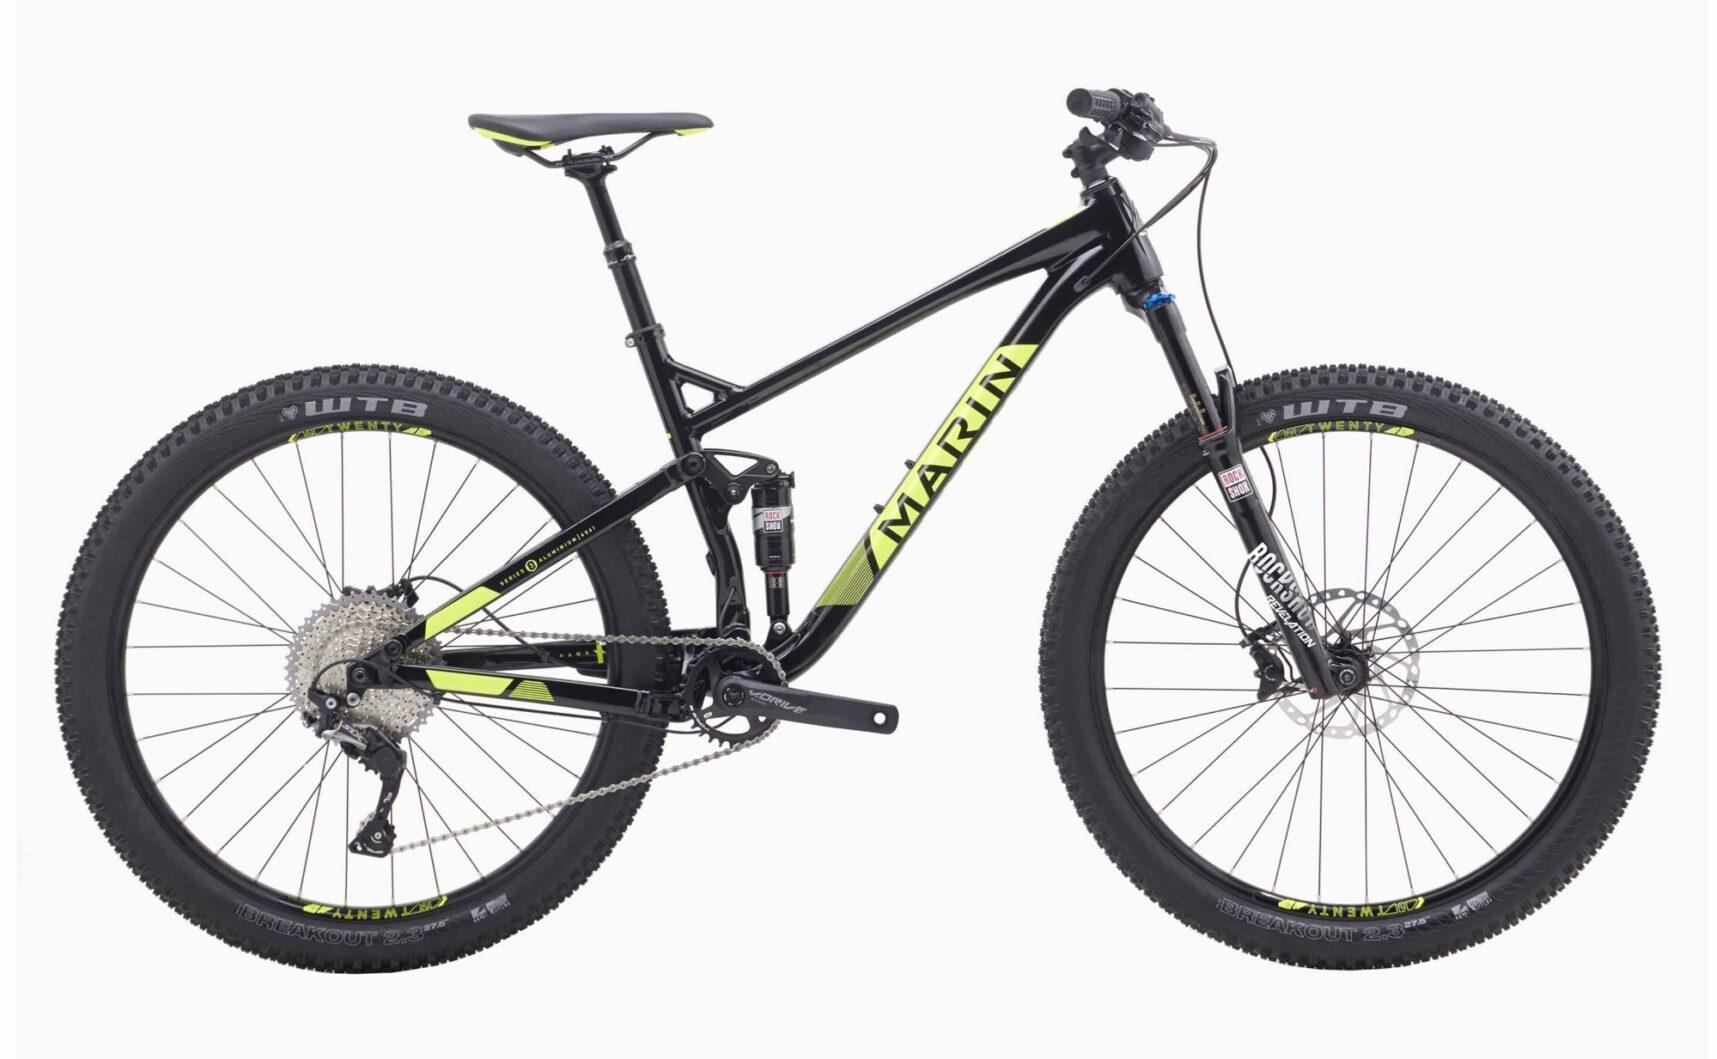 Marin Larkspur 2 bike detail.